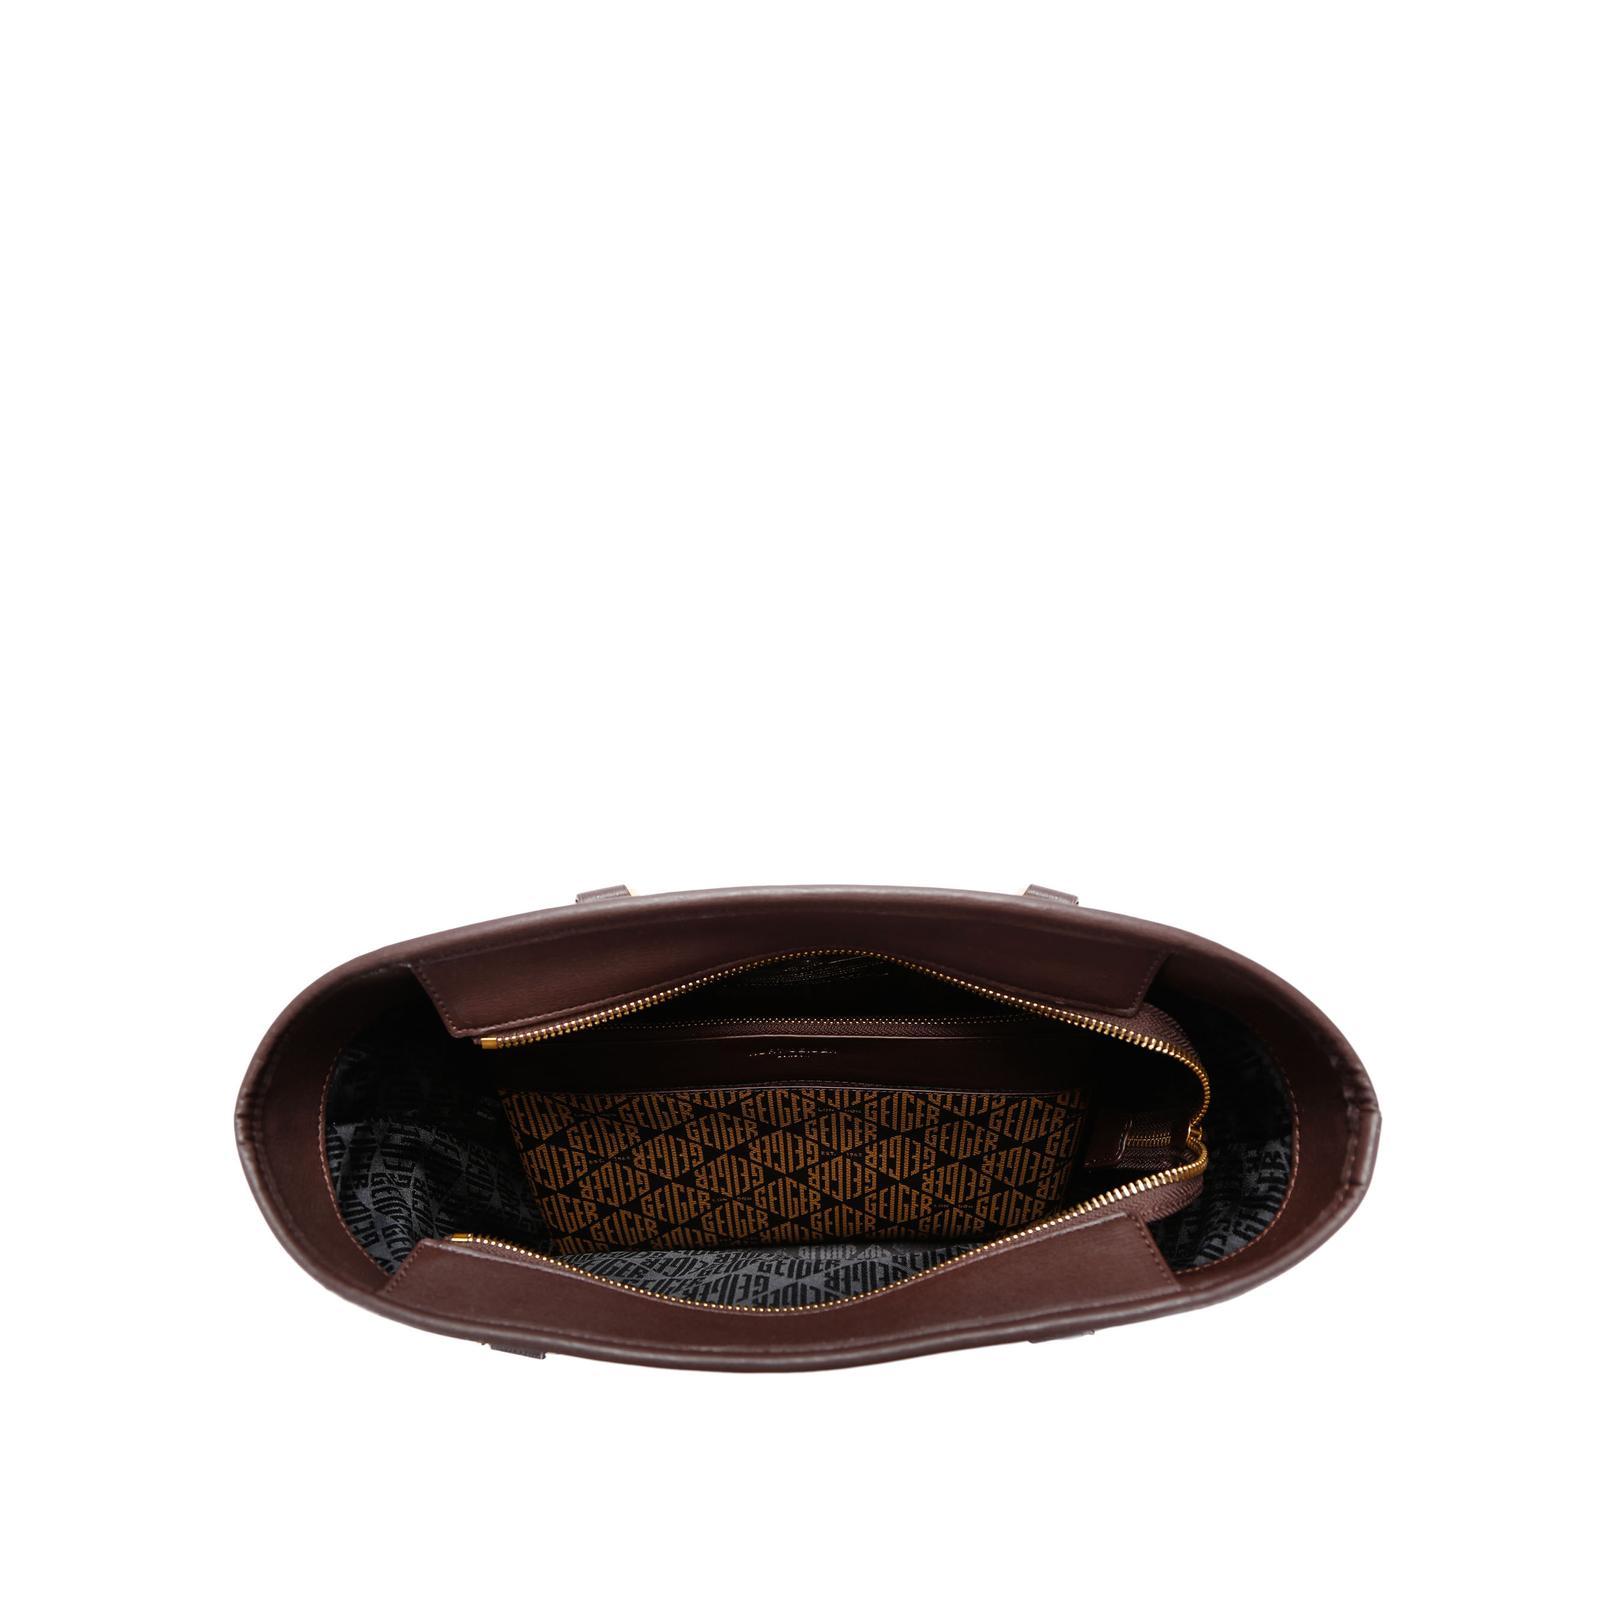 isabella versace 1969 isabella brown handbags by versace 1969. Black Bedroom Furniture Sets. Home Design Ideas